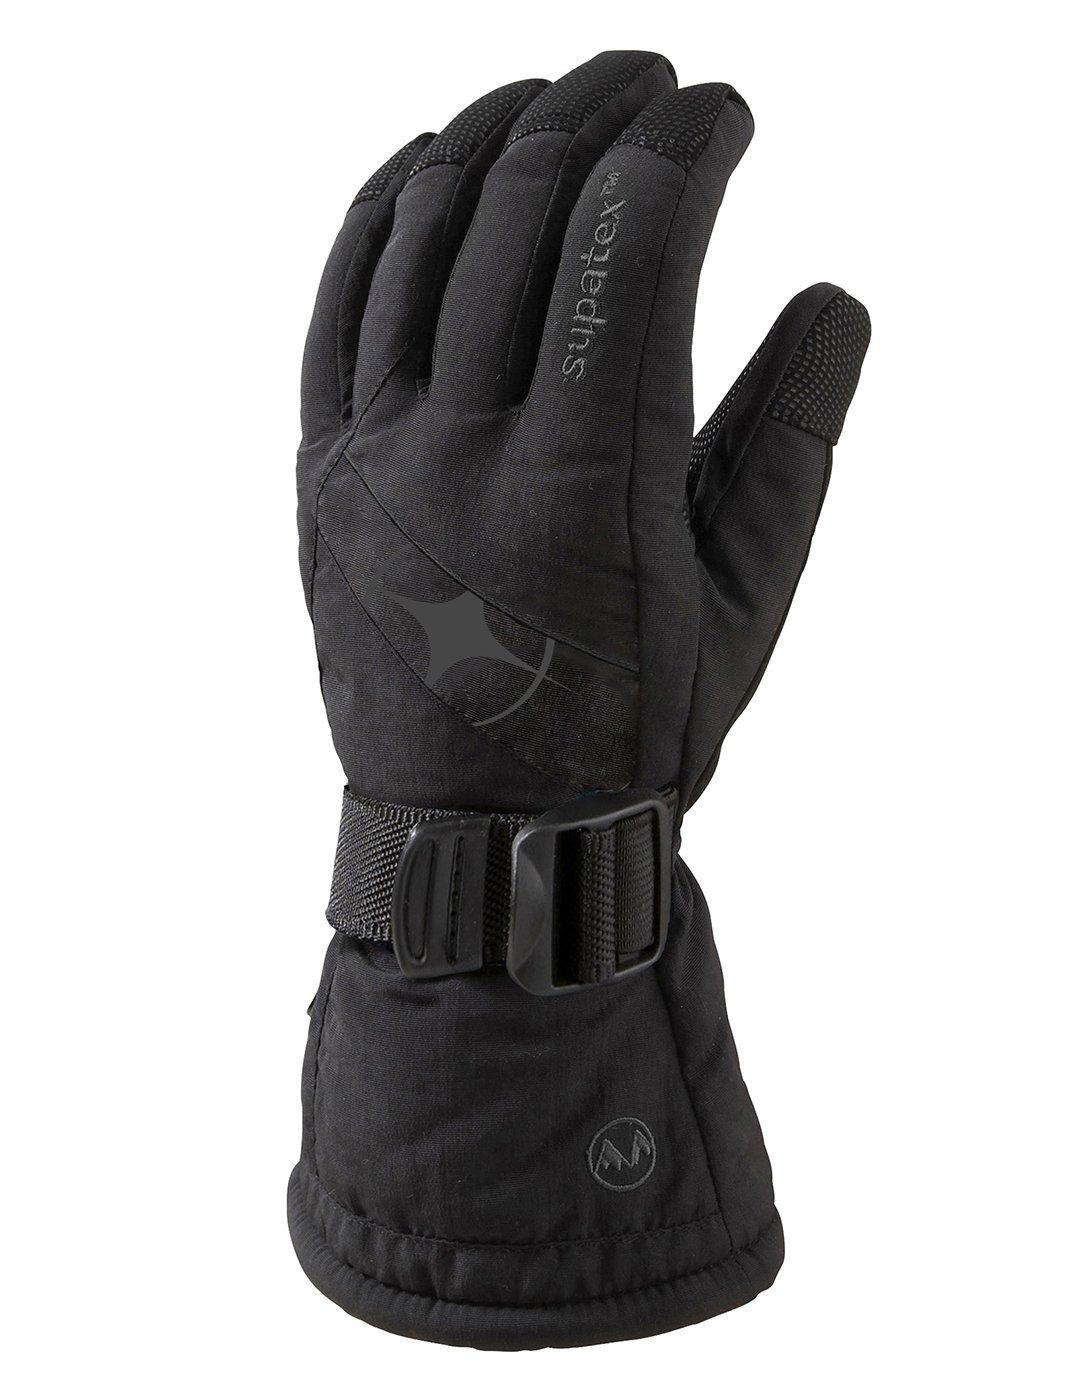 Mens Epic Ski Glove - Black Manbi